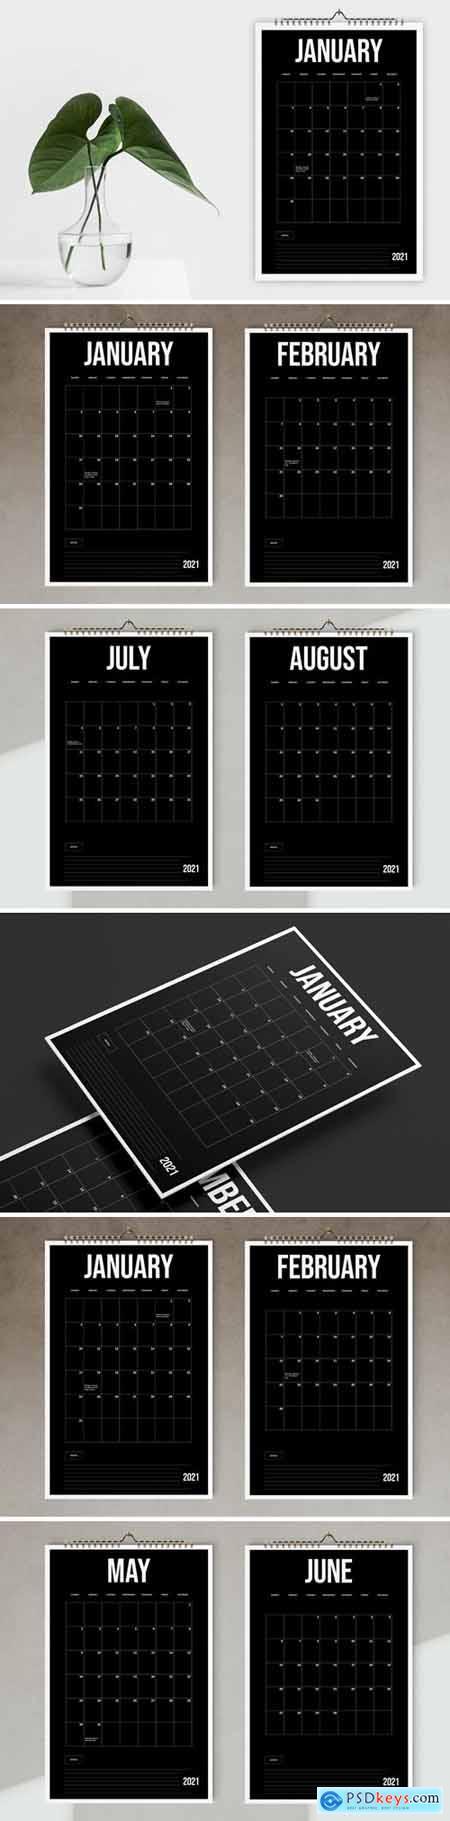 Black Wall Calendar 2021 Template